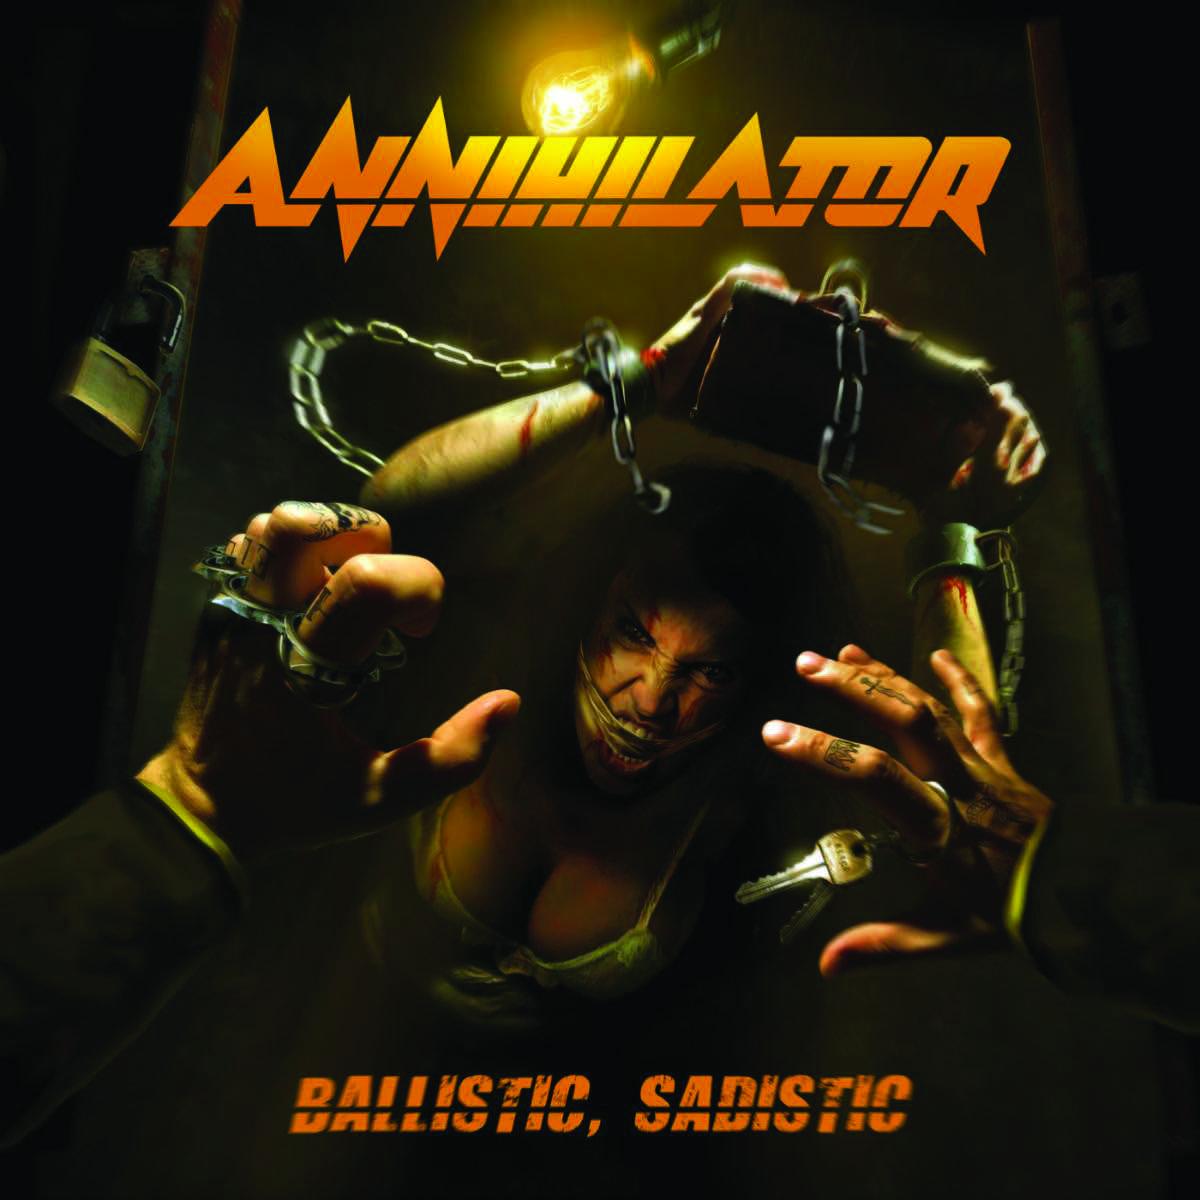 Annihilator Ballistic Sadistic hbls